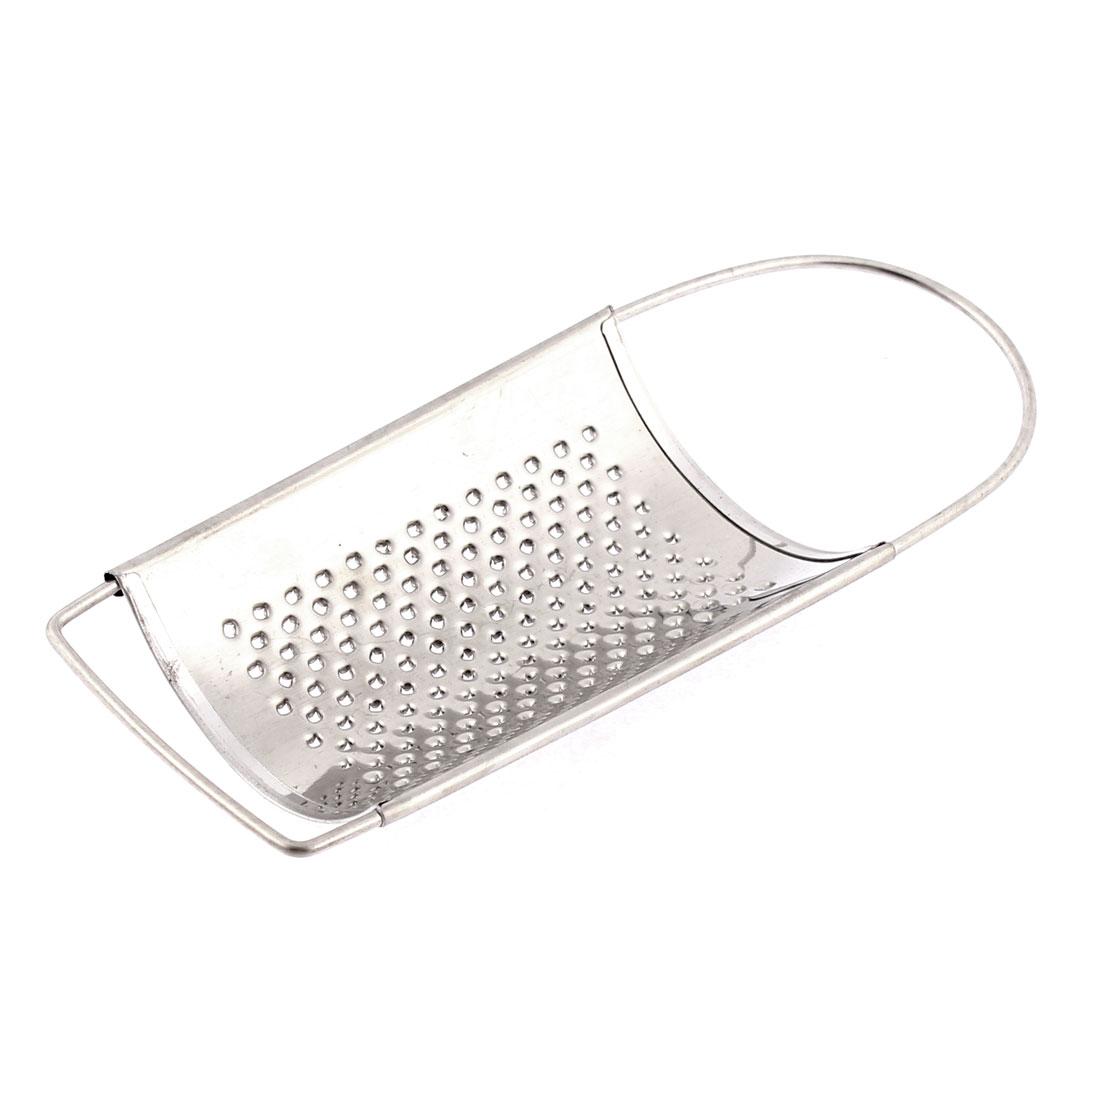 Kitchen Tool Handheld Stainless Steel Potato Fruit Garlic Ginger Curved Grater Shredder